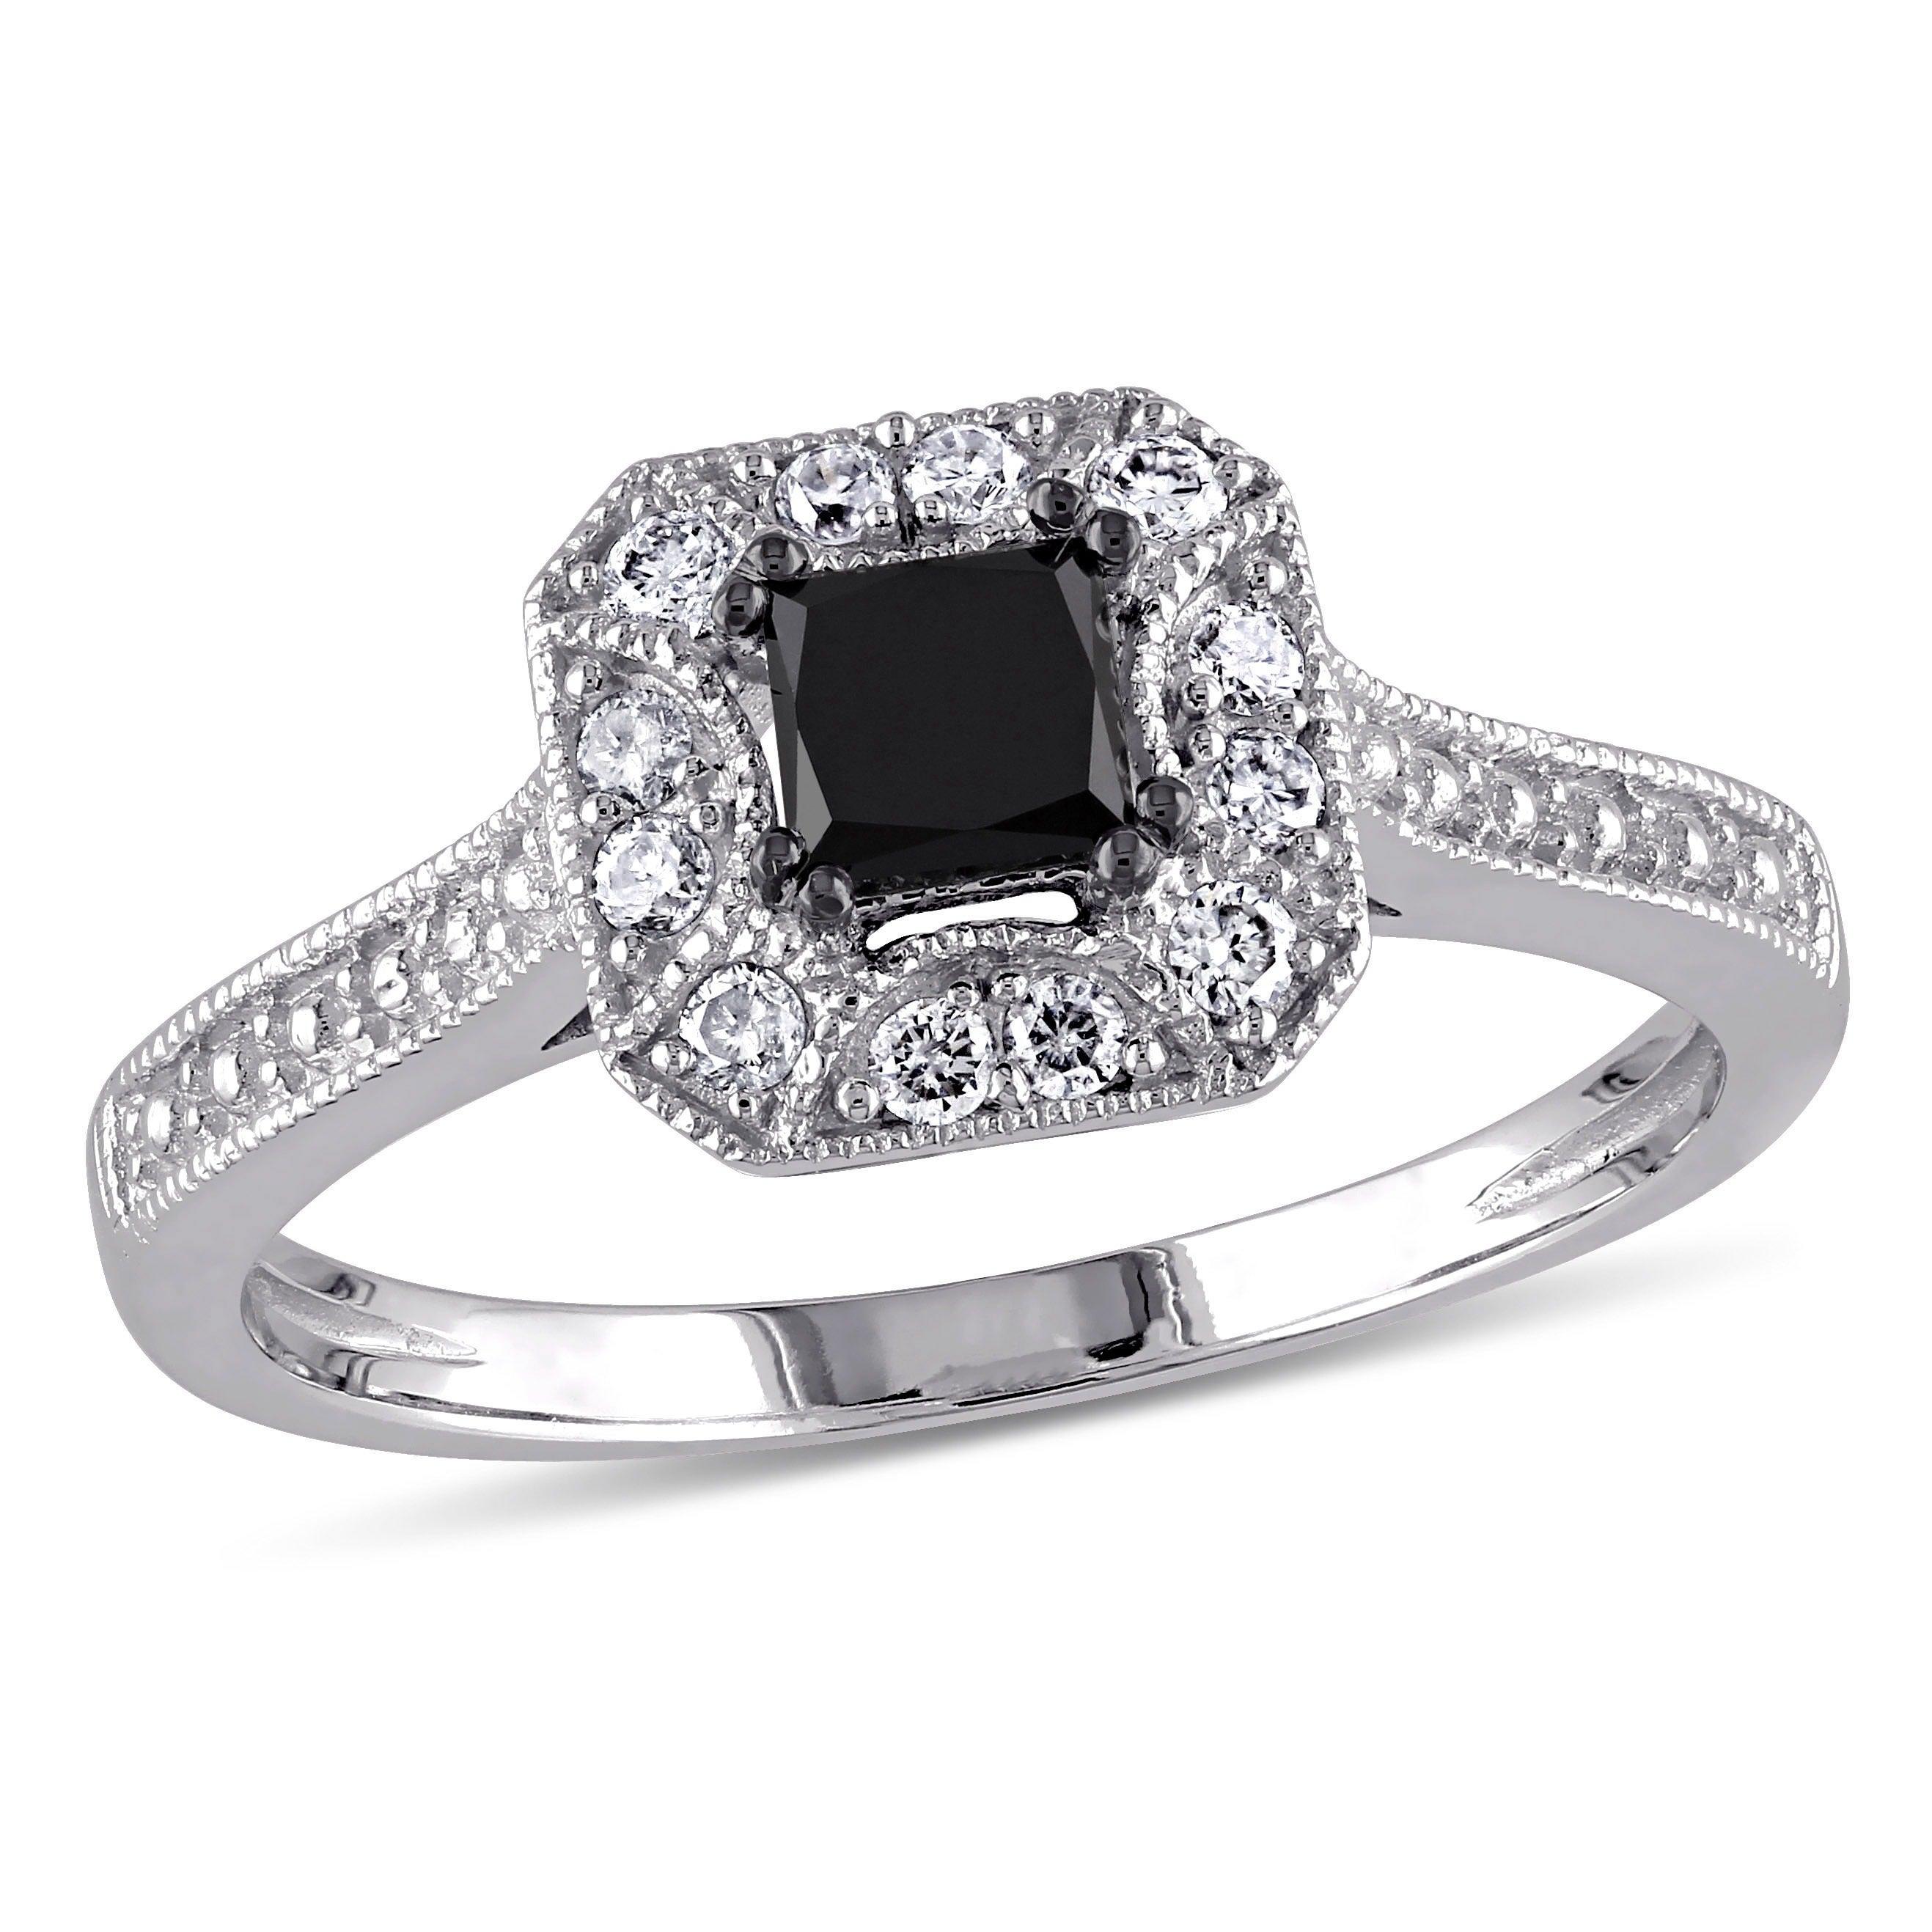 Shop Miadora 10k White Gold 3 5ct Tdw Black And White Princess Cut Diamond Square Halo Engagement Ring Overstock 5788219